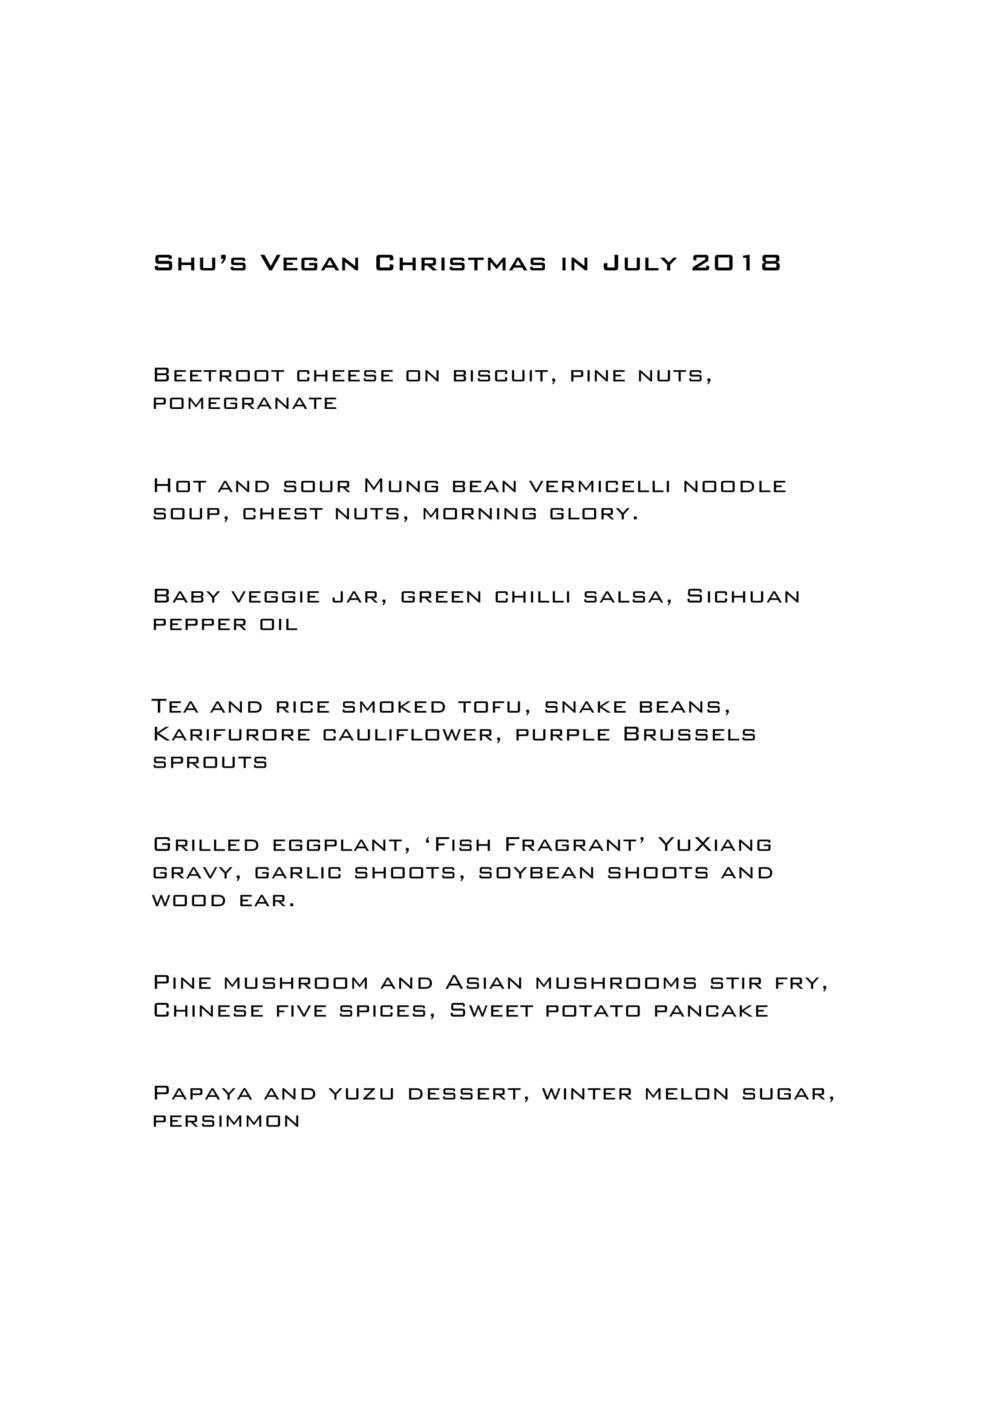 Shu's Vegan Christmas in July 2018 website ver-1.jpg